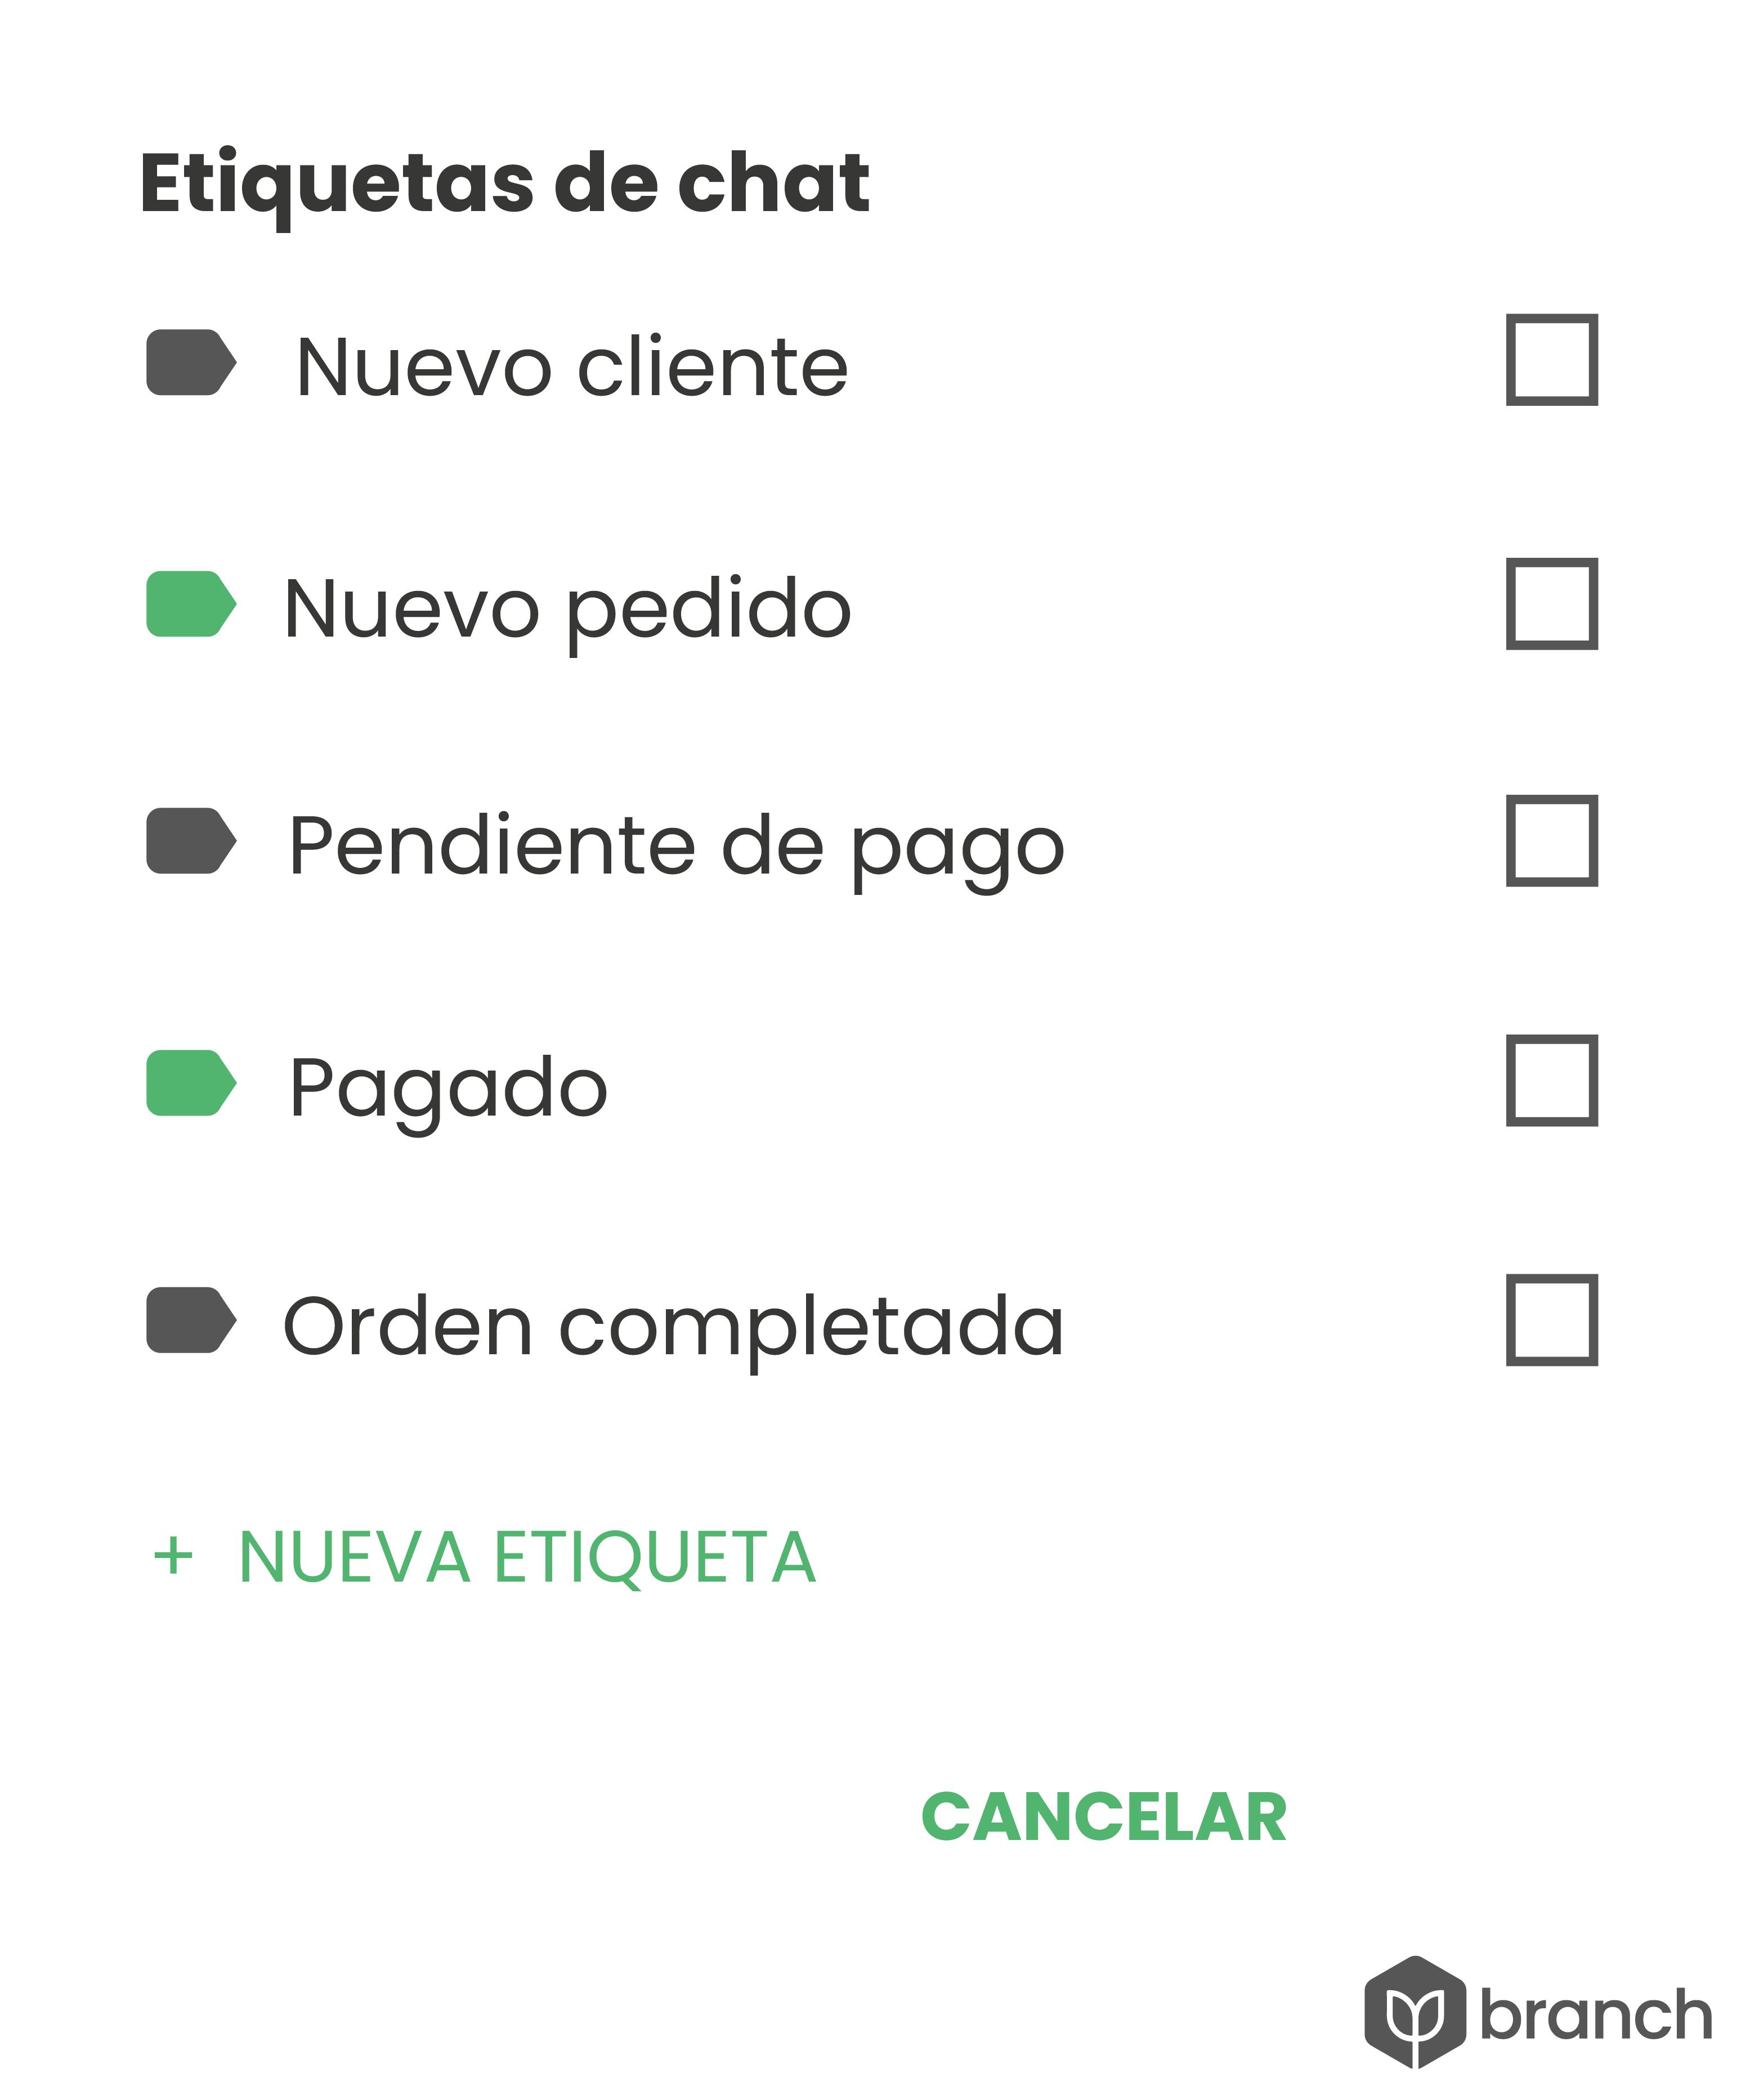 etiquetas-de-whatsapp-business